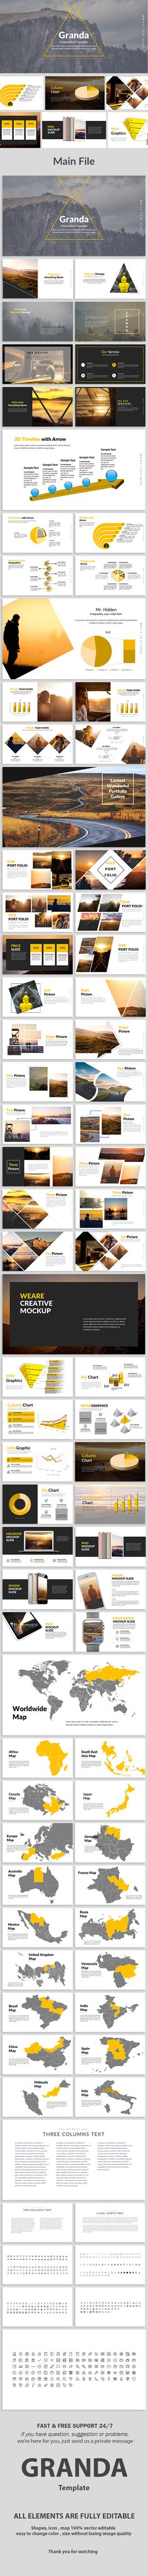 Granda Creative PowerPoint Template — Powerpoint PPT #entrepreneur • Download ➝ https://graphicriver.net/item/granda-creative-powerpoint-template/19472335?ref=pxcr